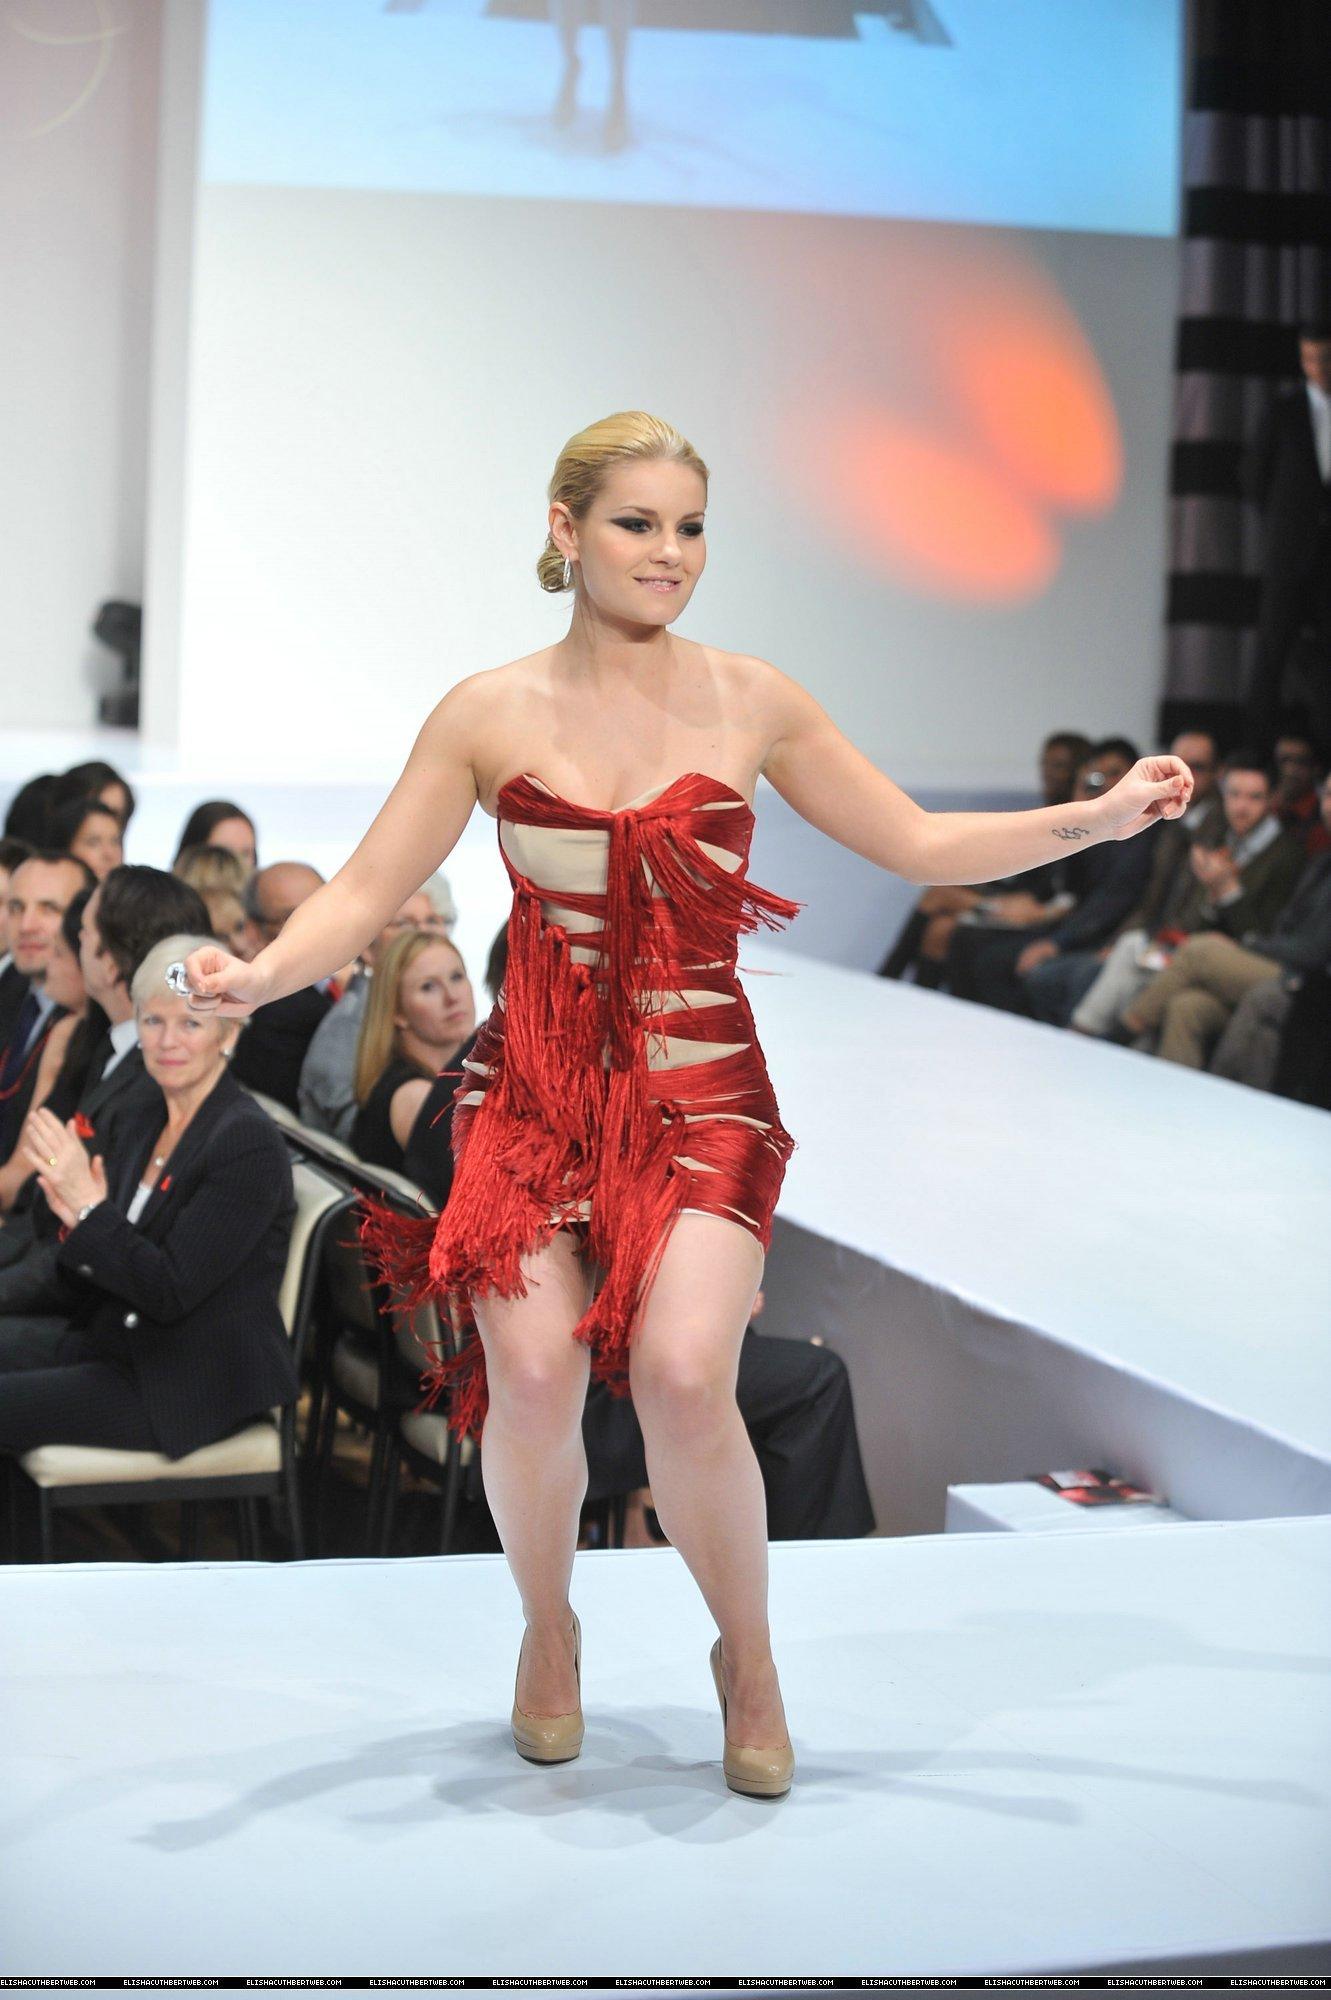 Elisha @ the Heart Truth fashion show 3/24/11